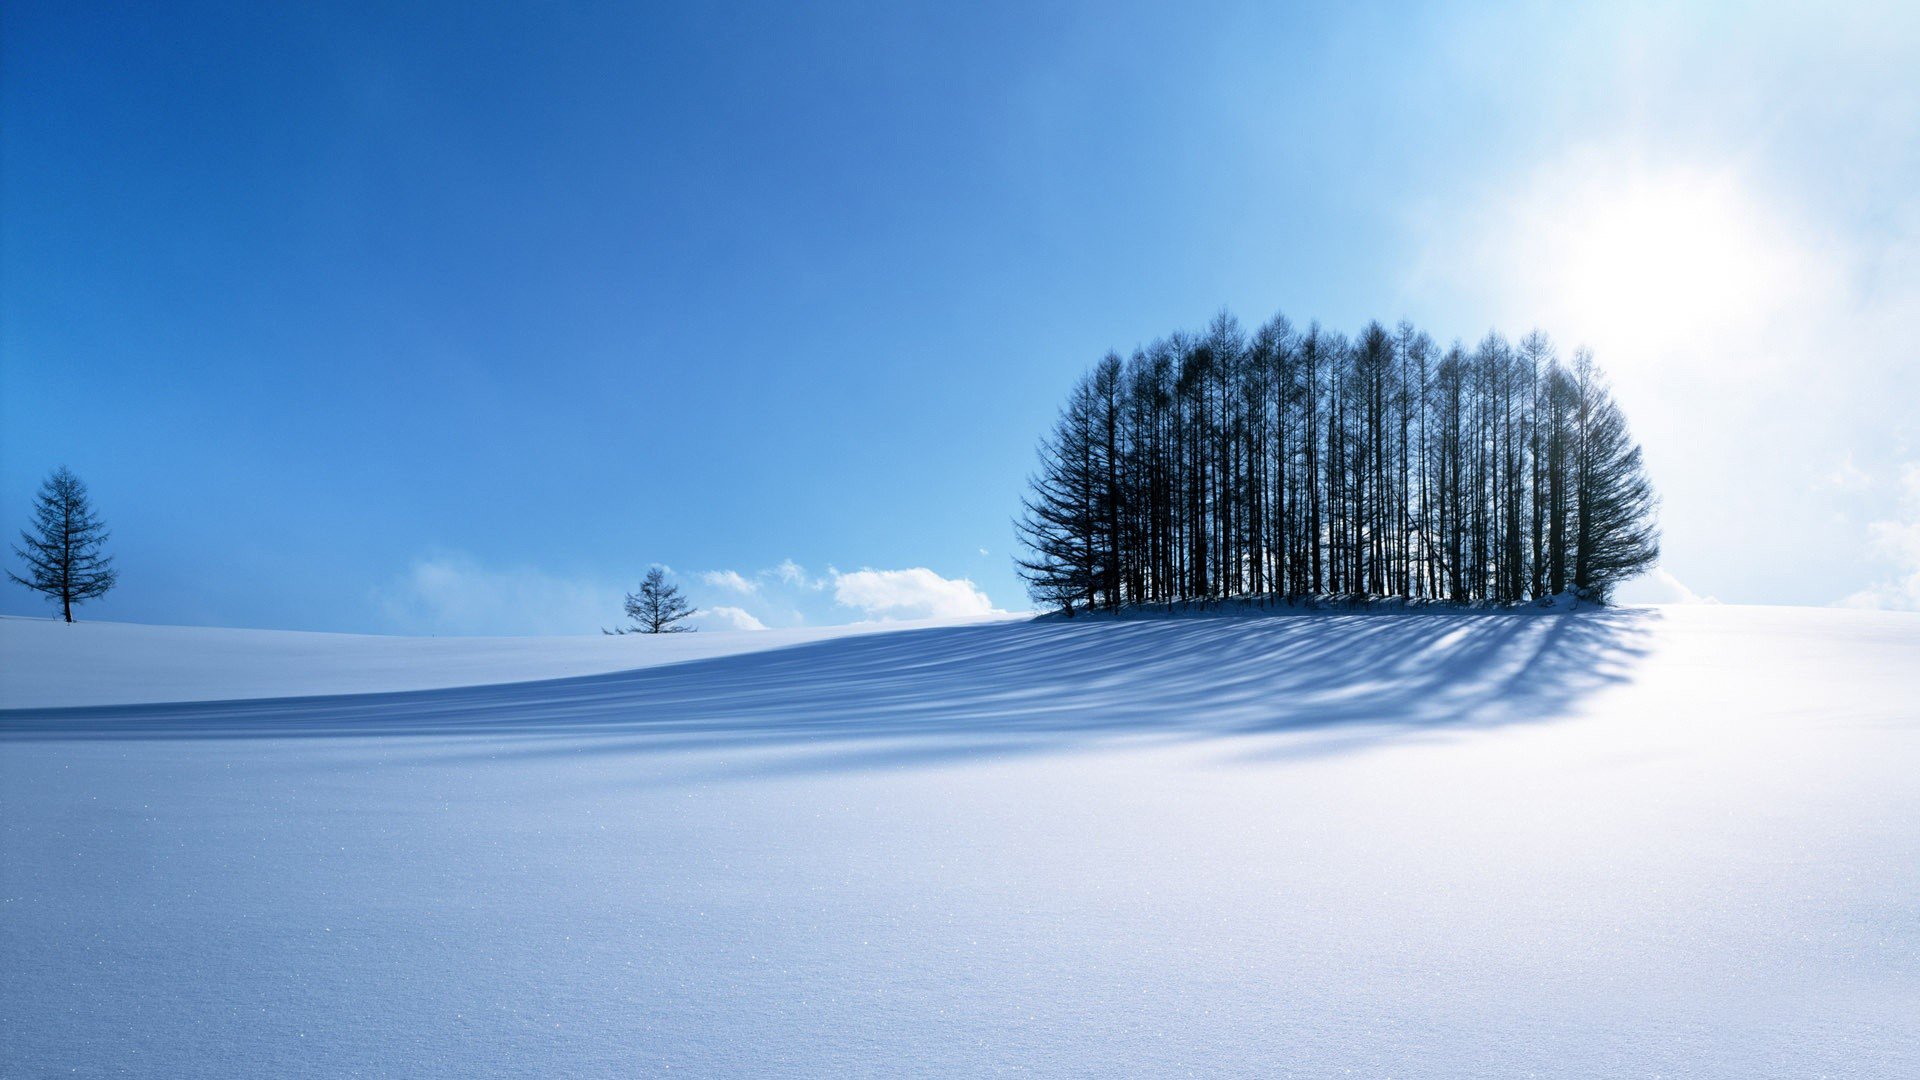 Download Wallpaper High Resolution Winter - Winter-HD-Wallpapers-004  2018_39368.jpg